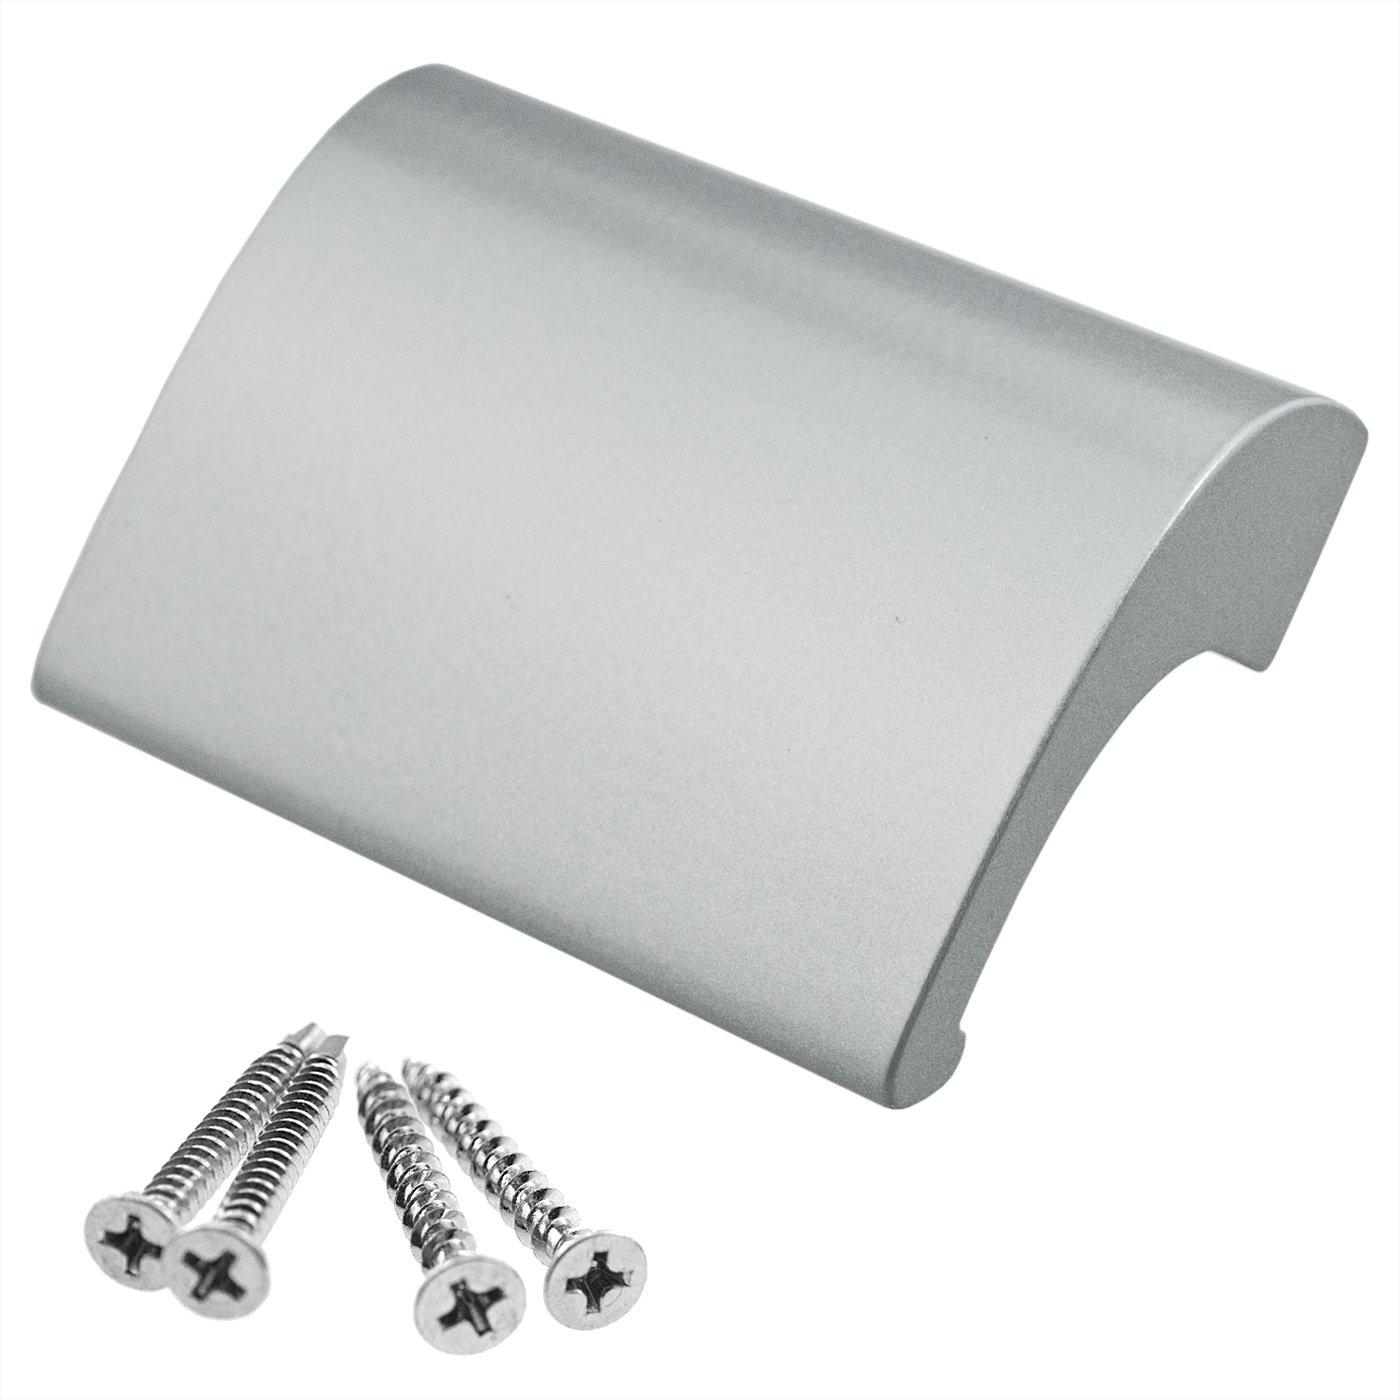 Farbe gold Aluminium FH-Stabil Balkont/ürgriff Balkongriff Ziehgriff Terrassent/ürgriff Deluxe